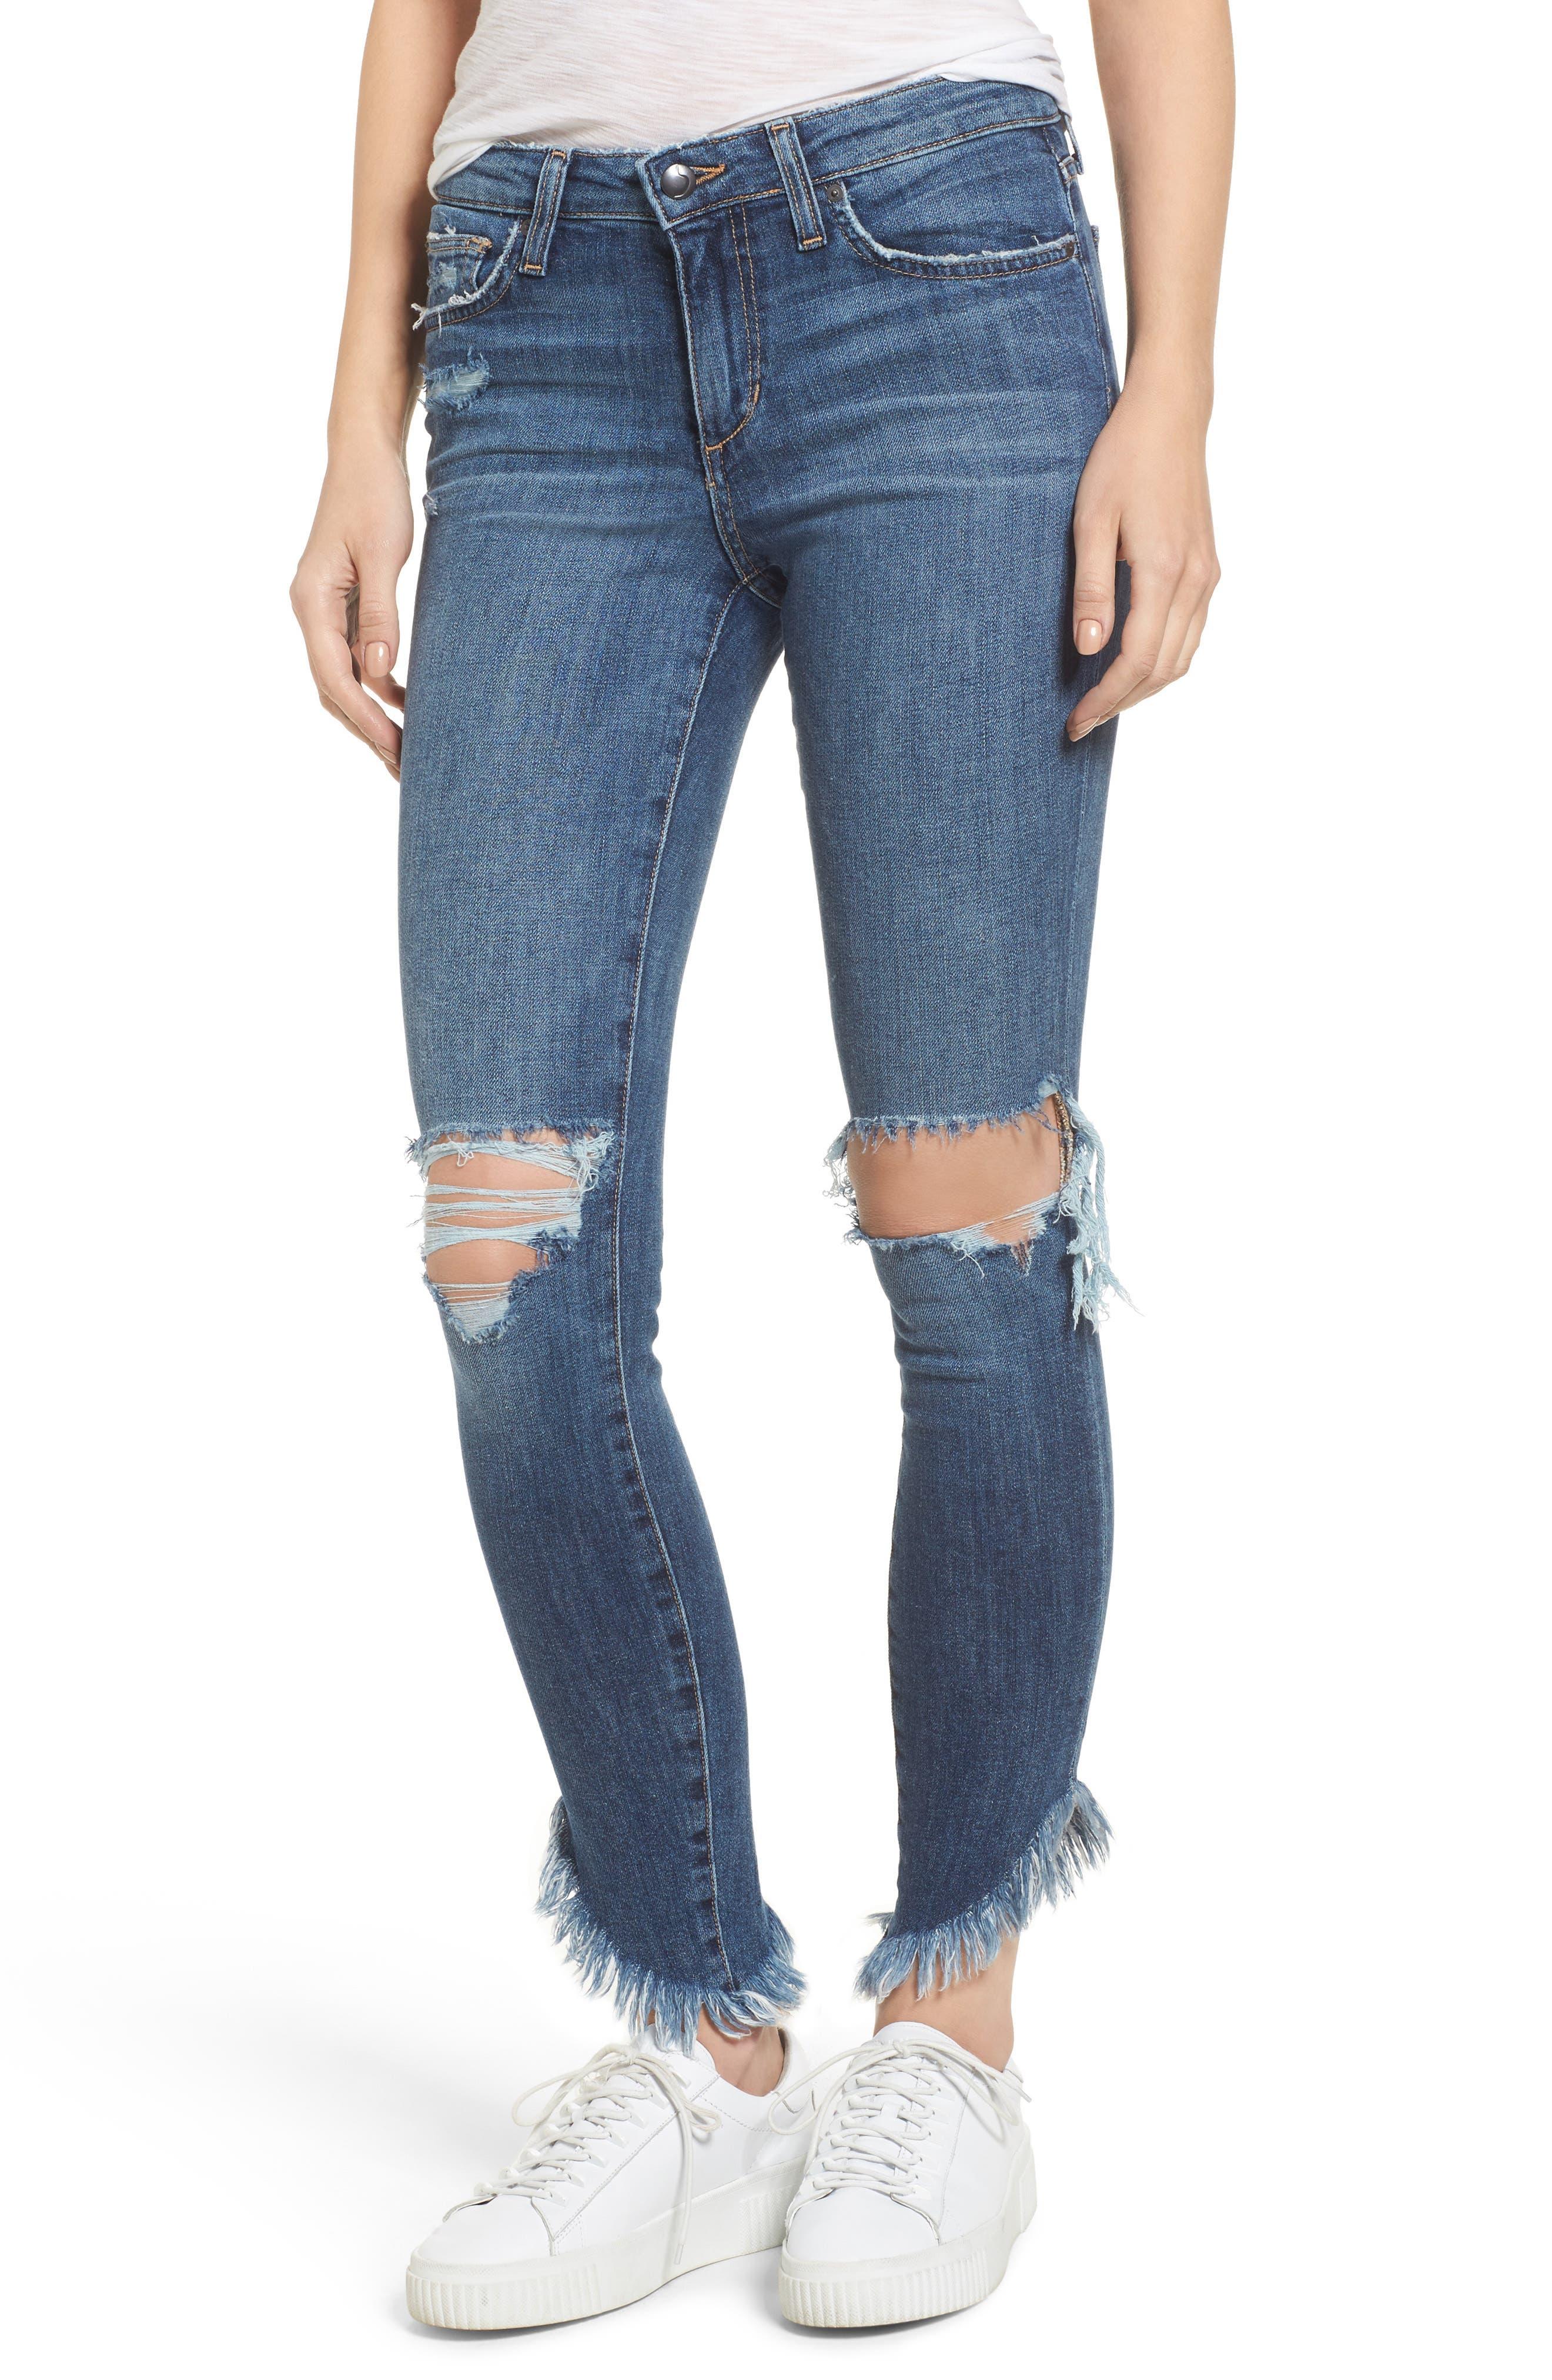 Alternate Image 1 Selected - Joe's Icon Ankle Skinny Jeans (Aydin)